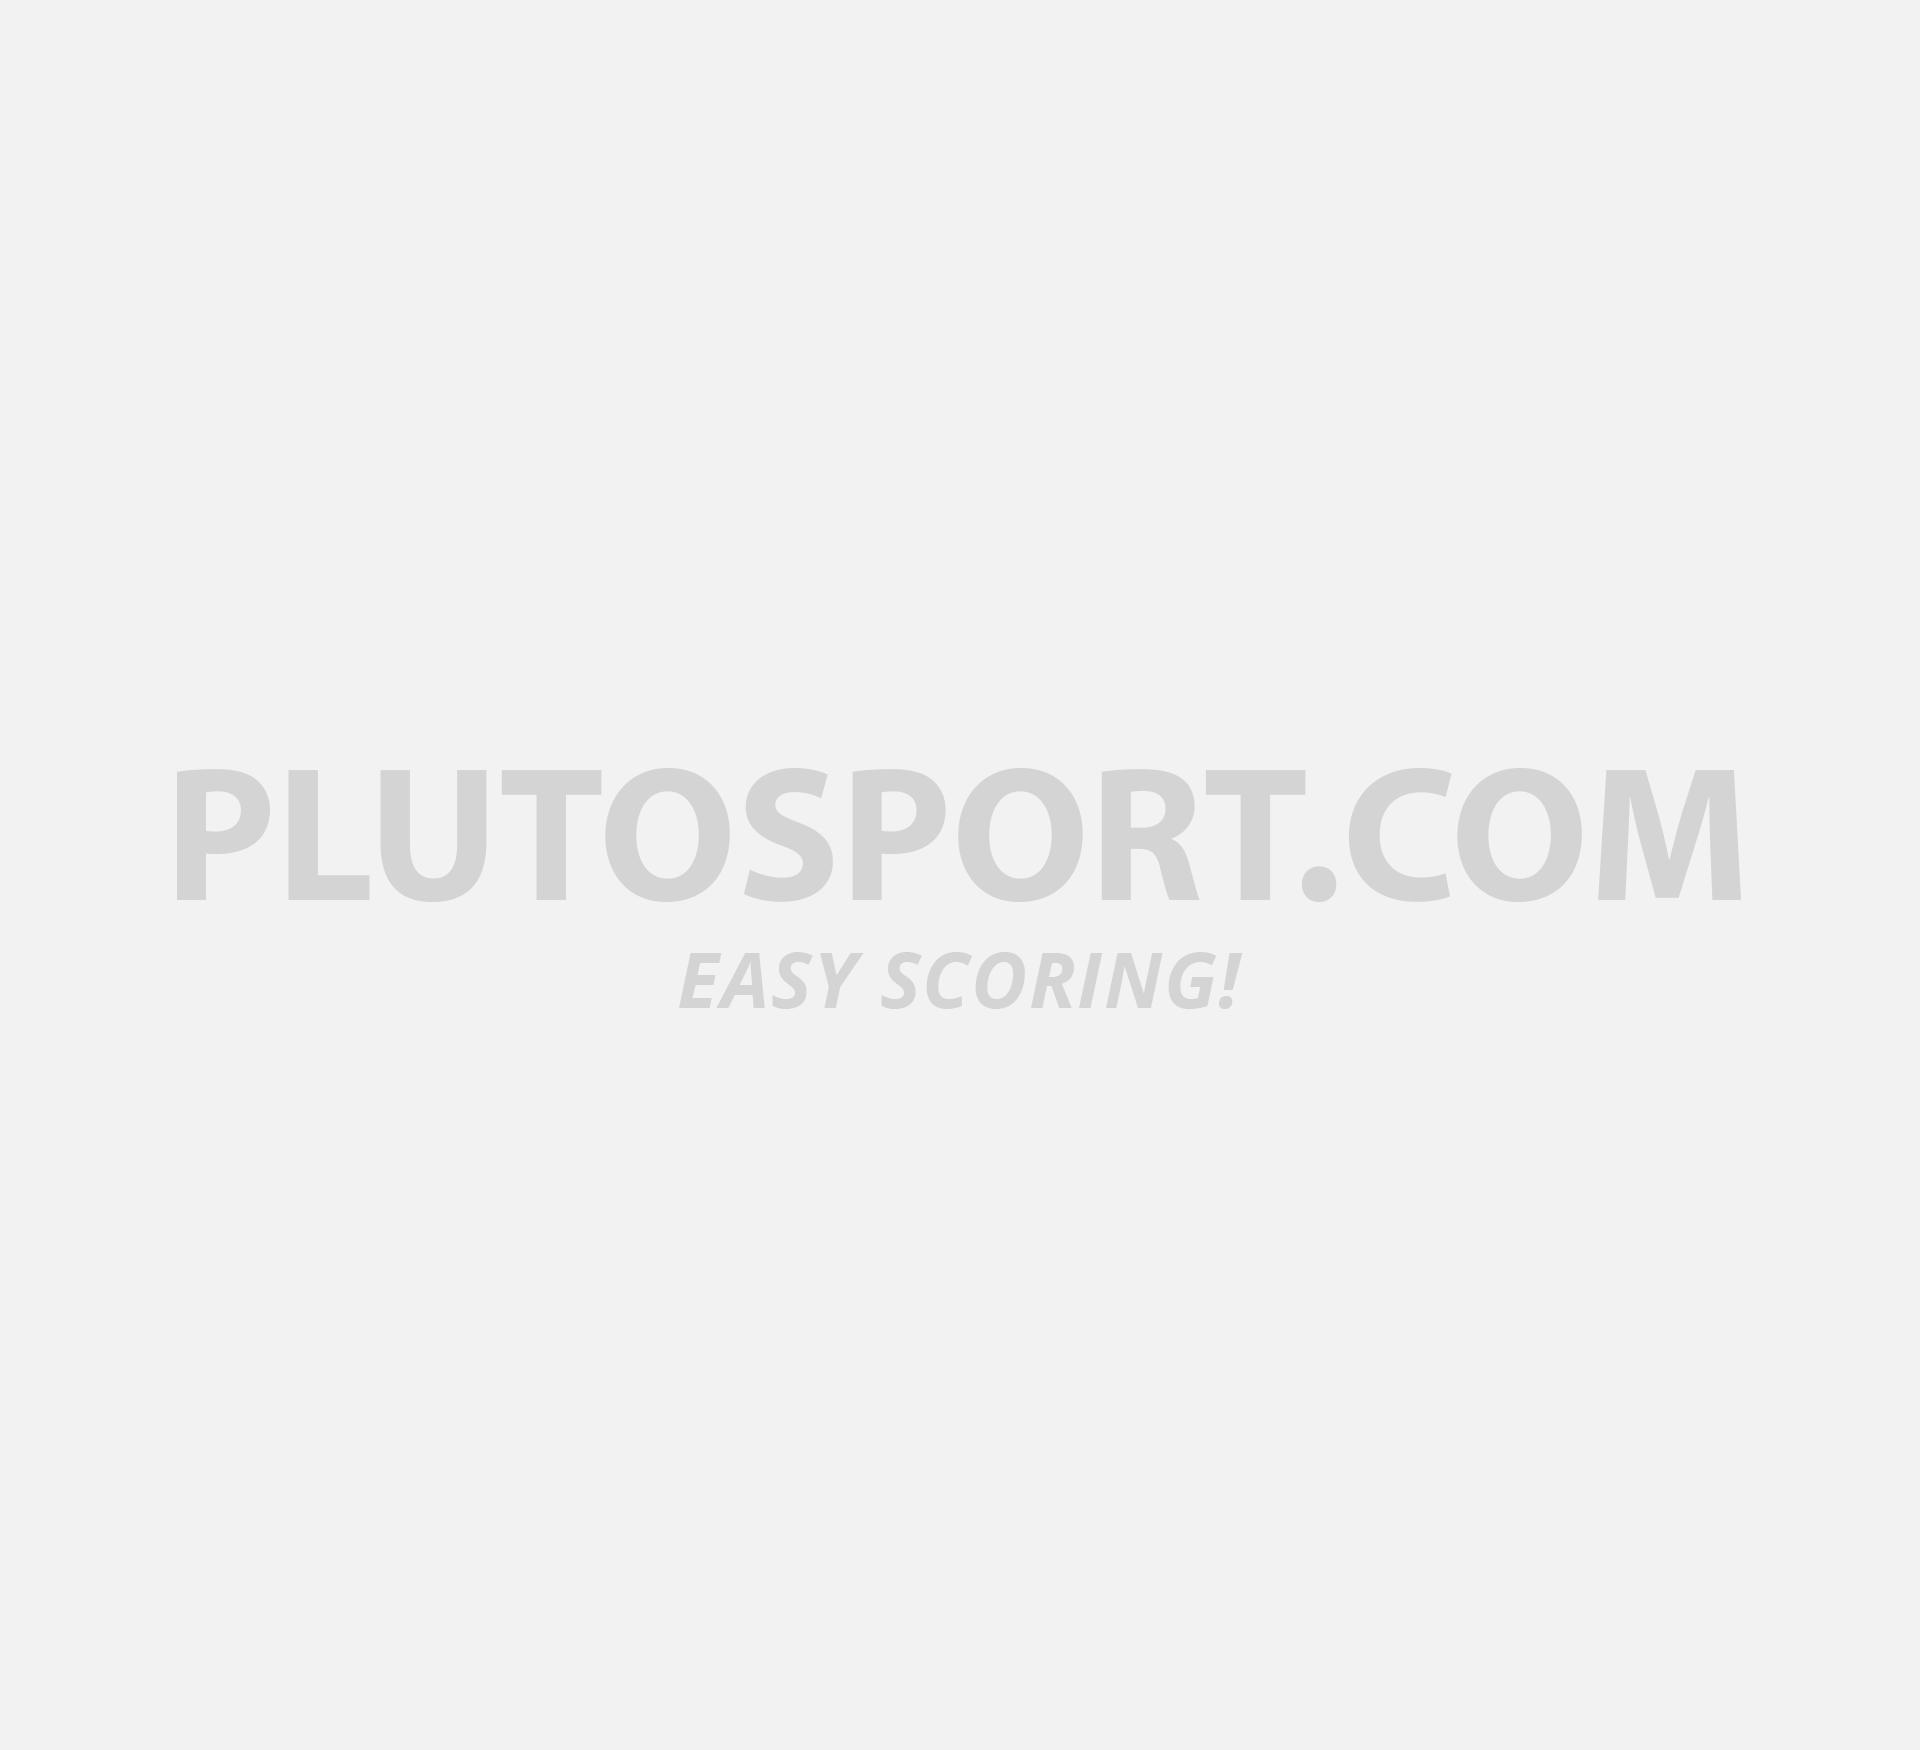 d308f87dc000 Adidas F10 Indoor Football Shoe Junior - Boots indoor - Shoes - Football -  Sports | Plutosport